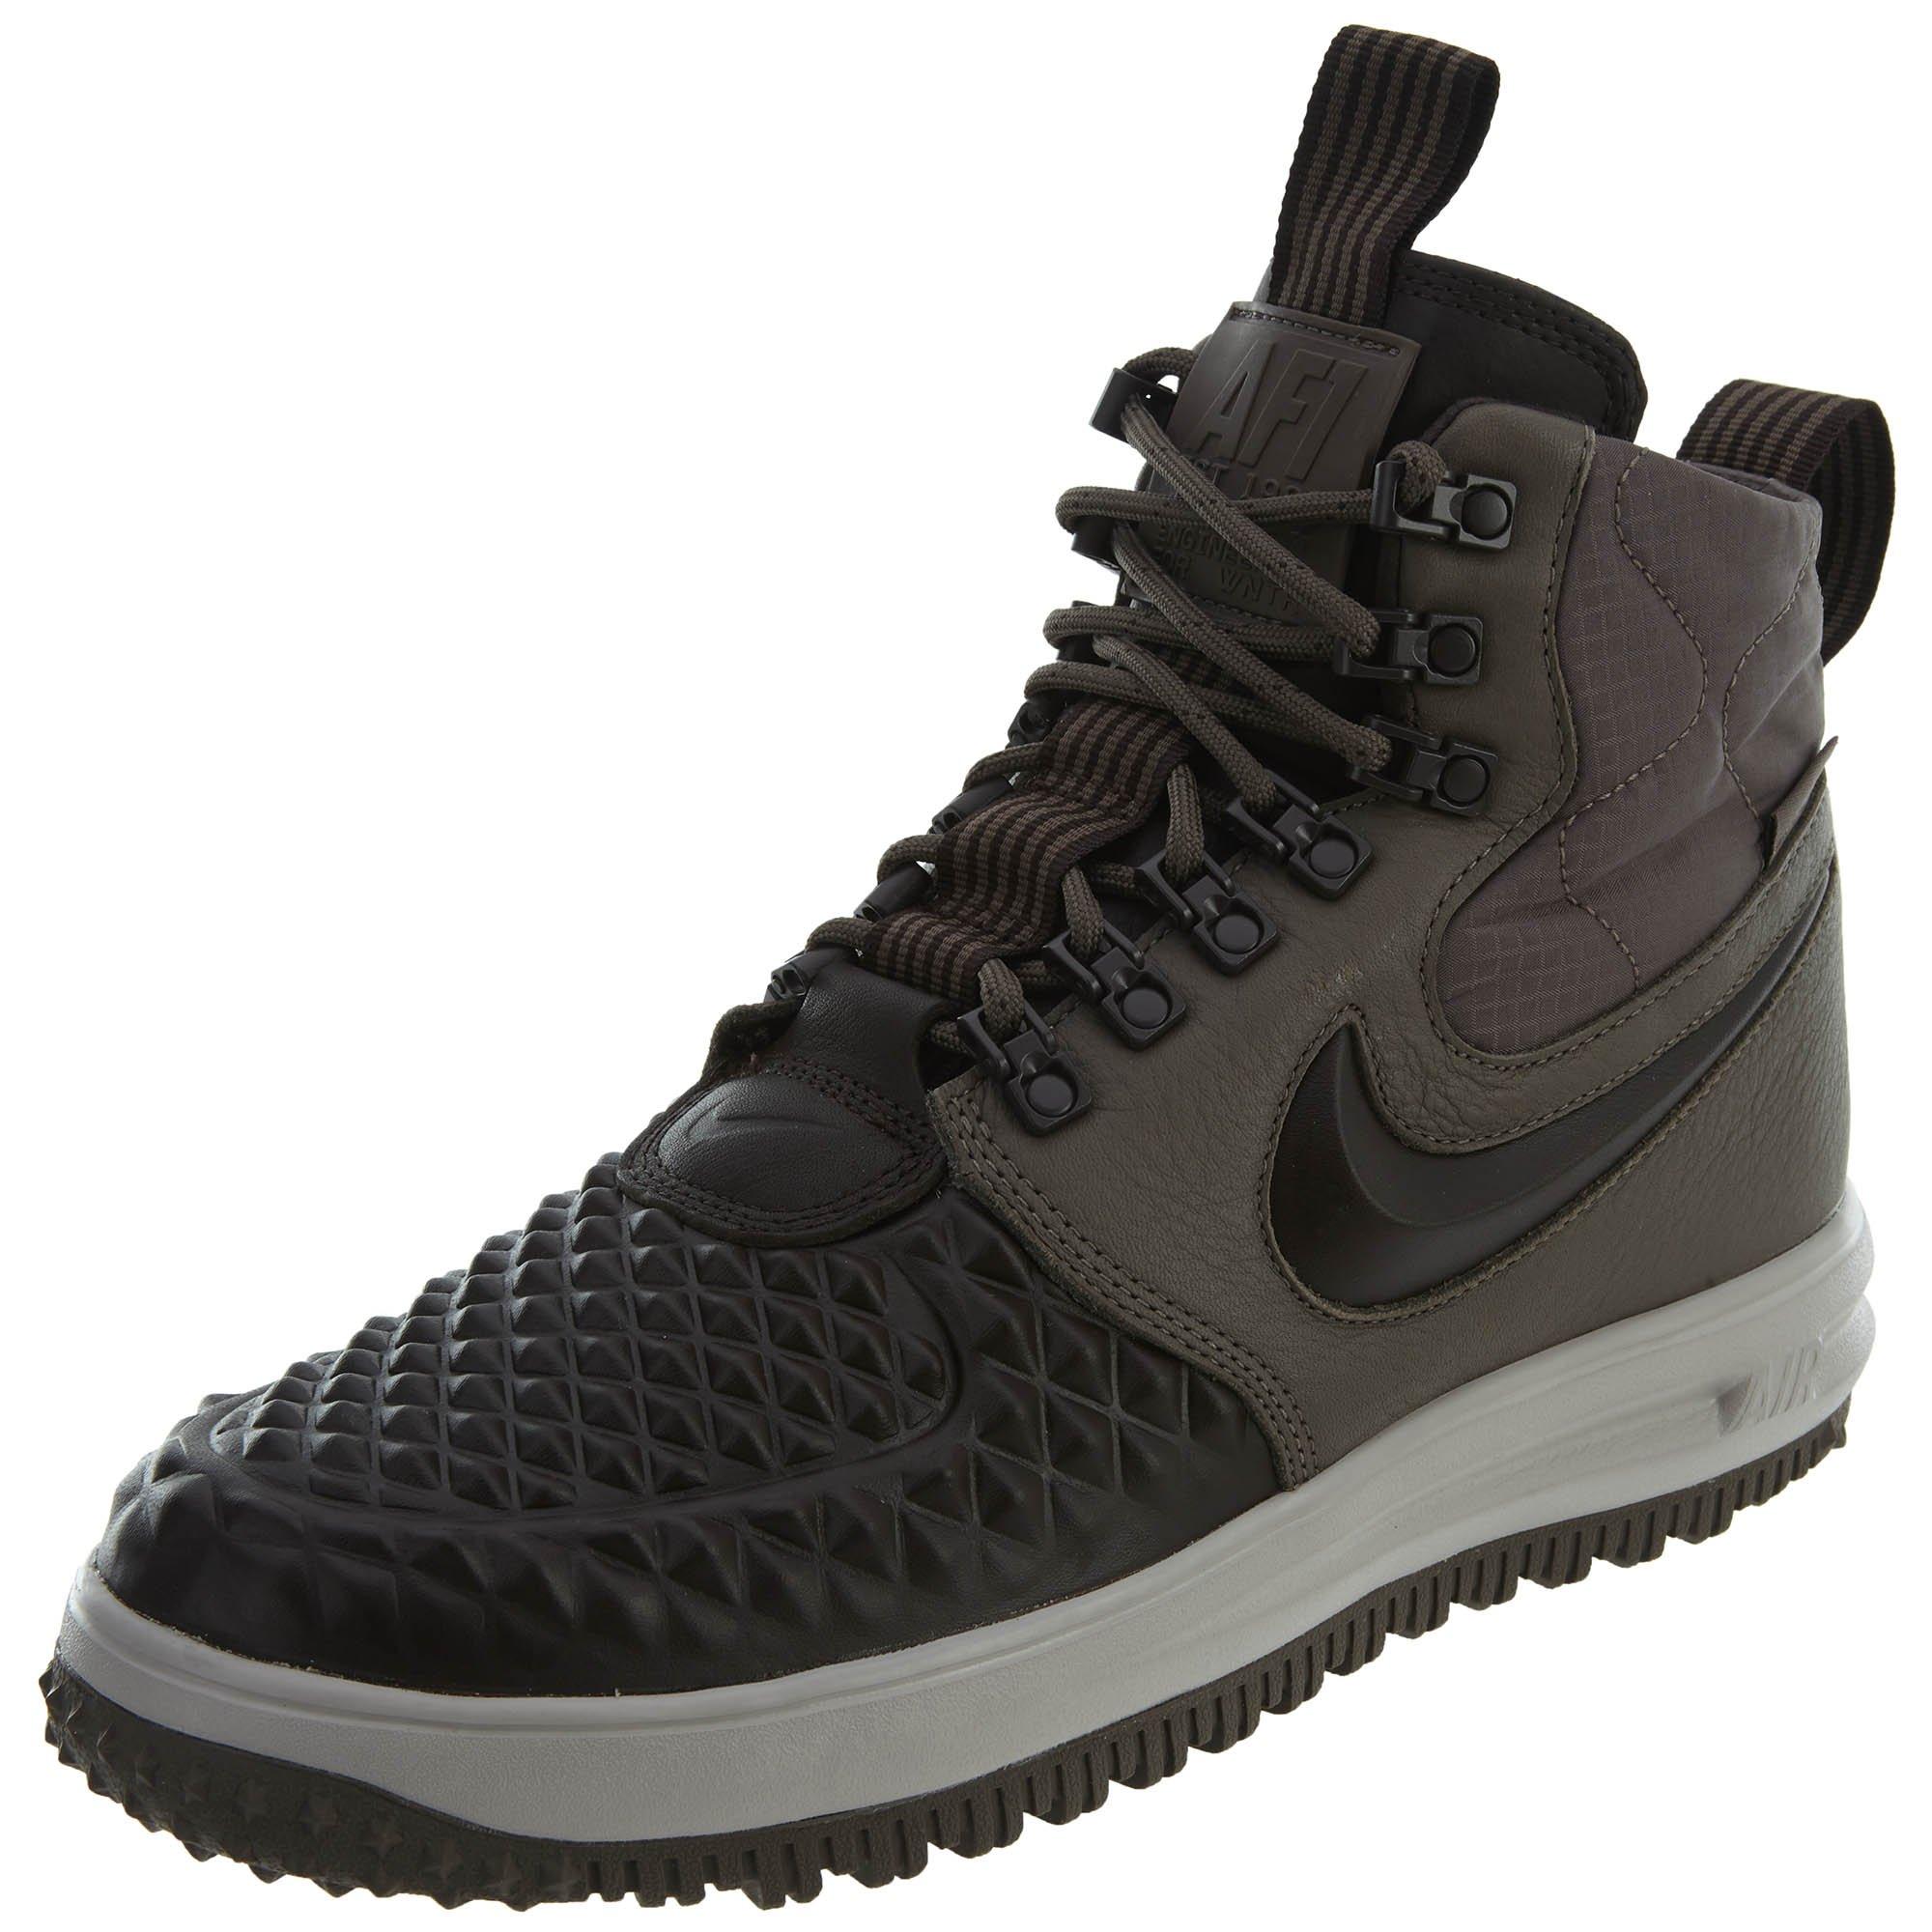 Nike Lunar Force 1 Duckboot 2017 Men Lifestyle SNEAKERS Olive 916682 202 11.5